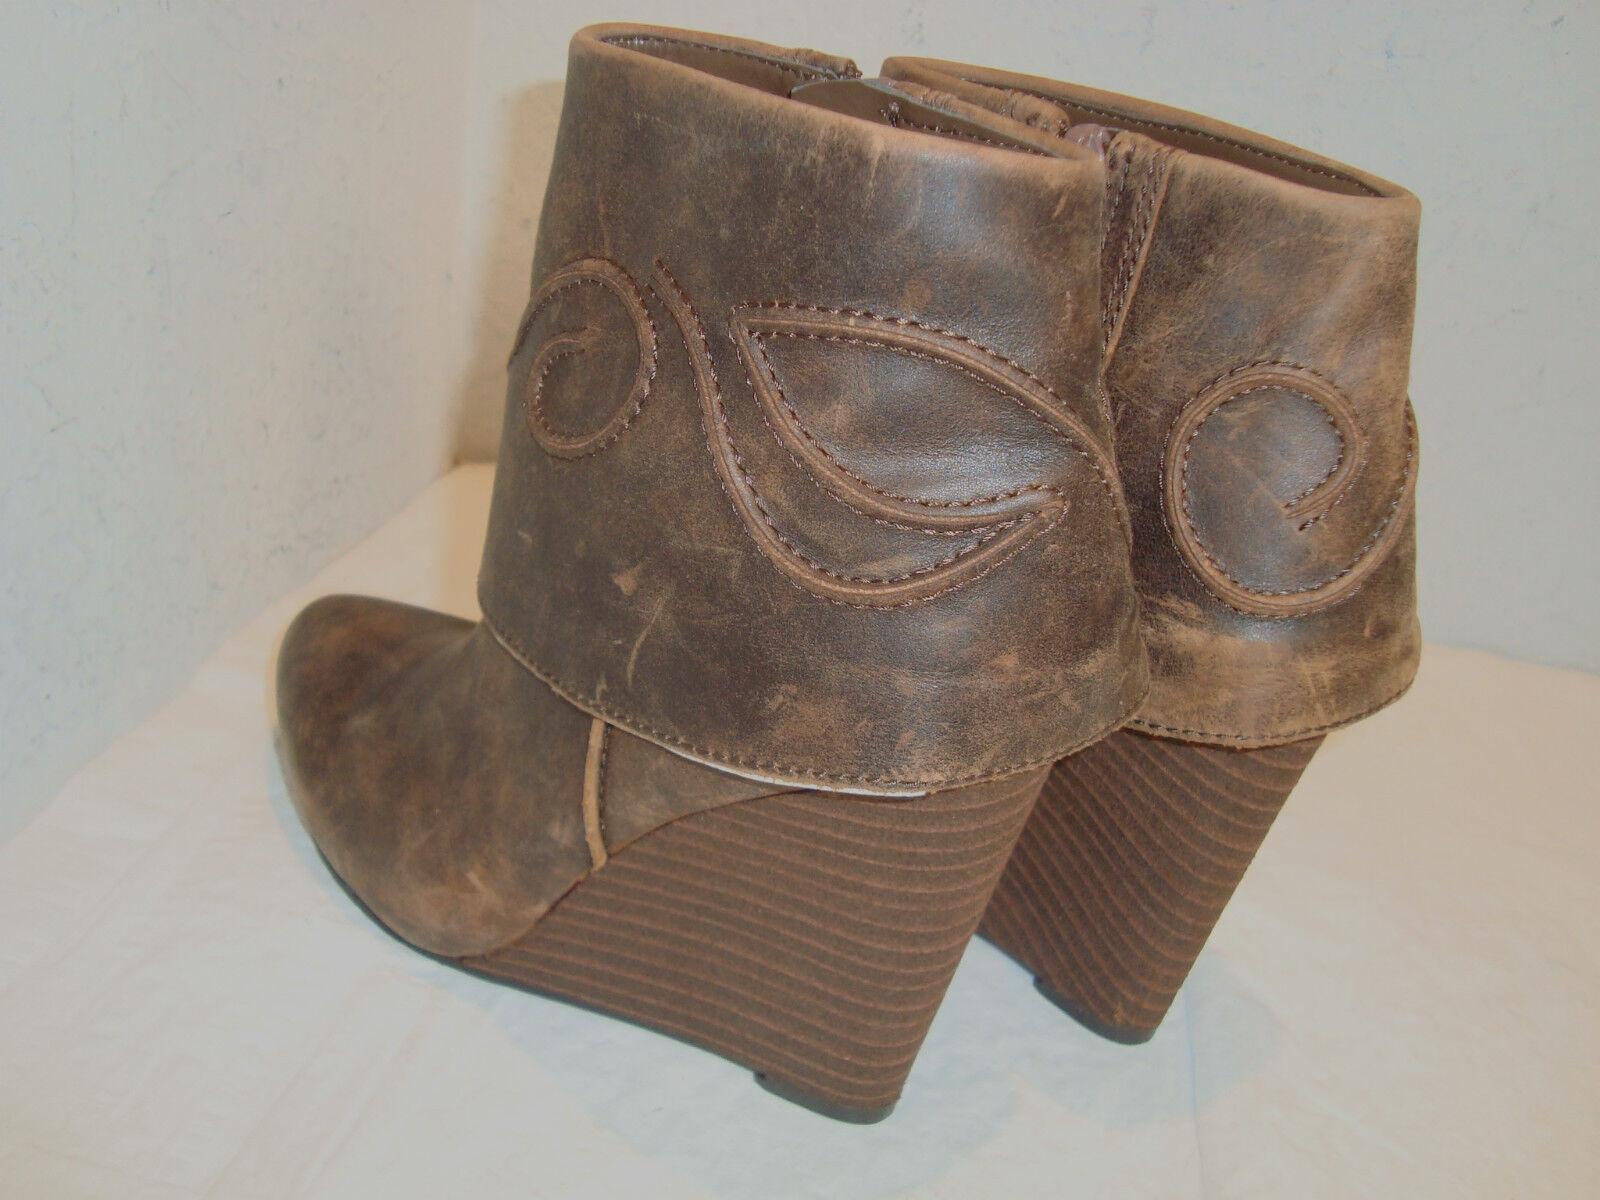 NEU Carlos By Carlos Santana Damenschuhe Trace Braun Wedge Ankle Stiefel 5.5 Medium